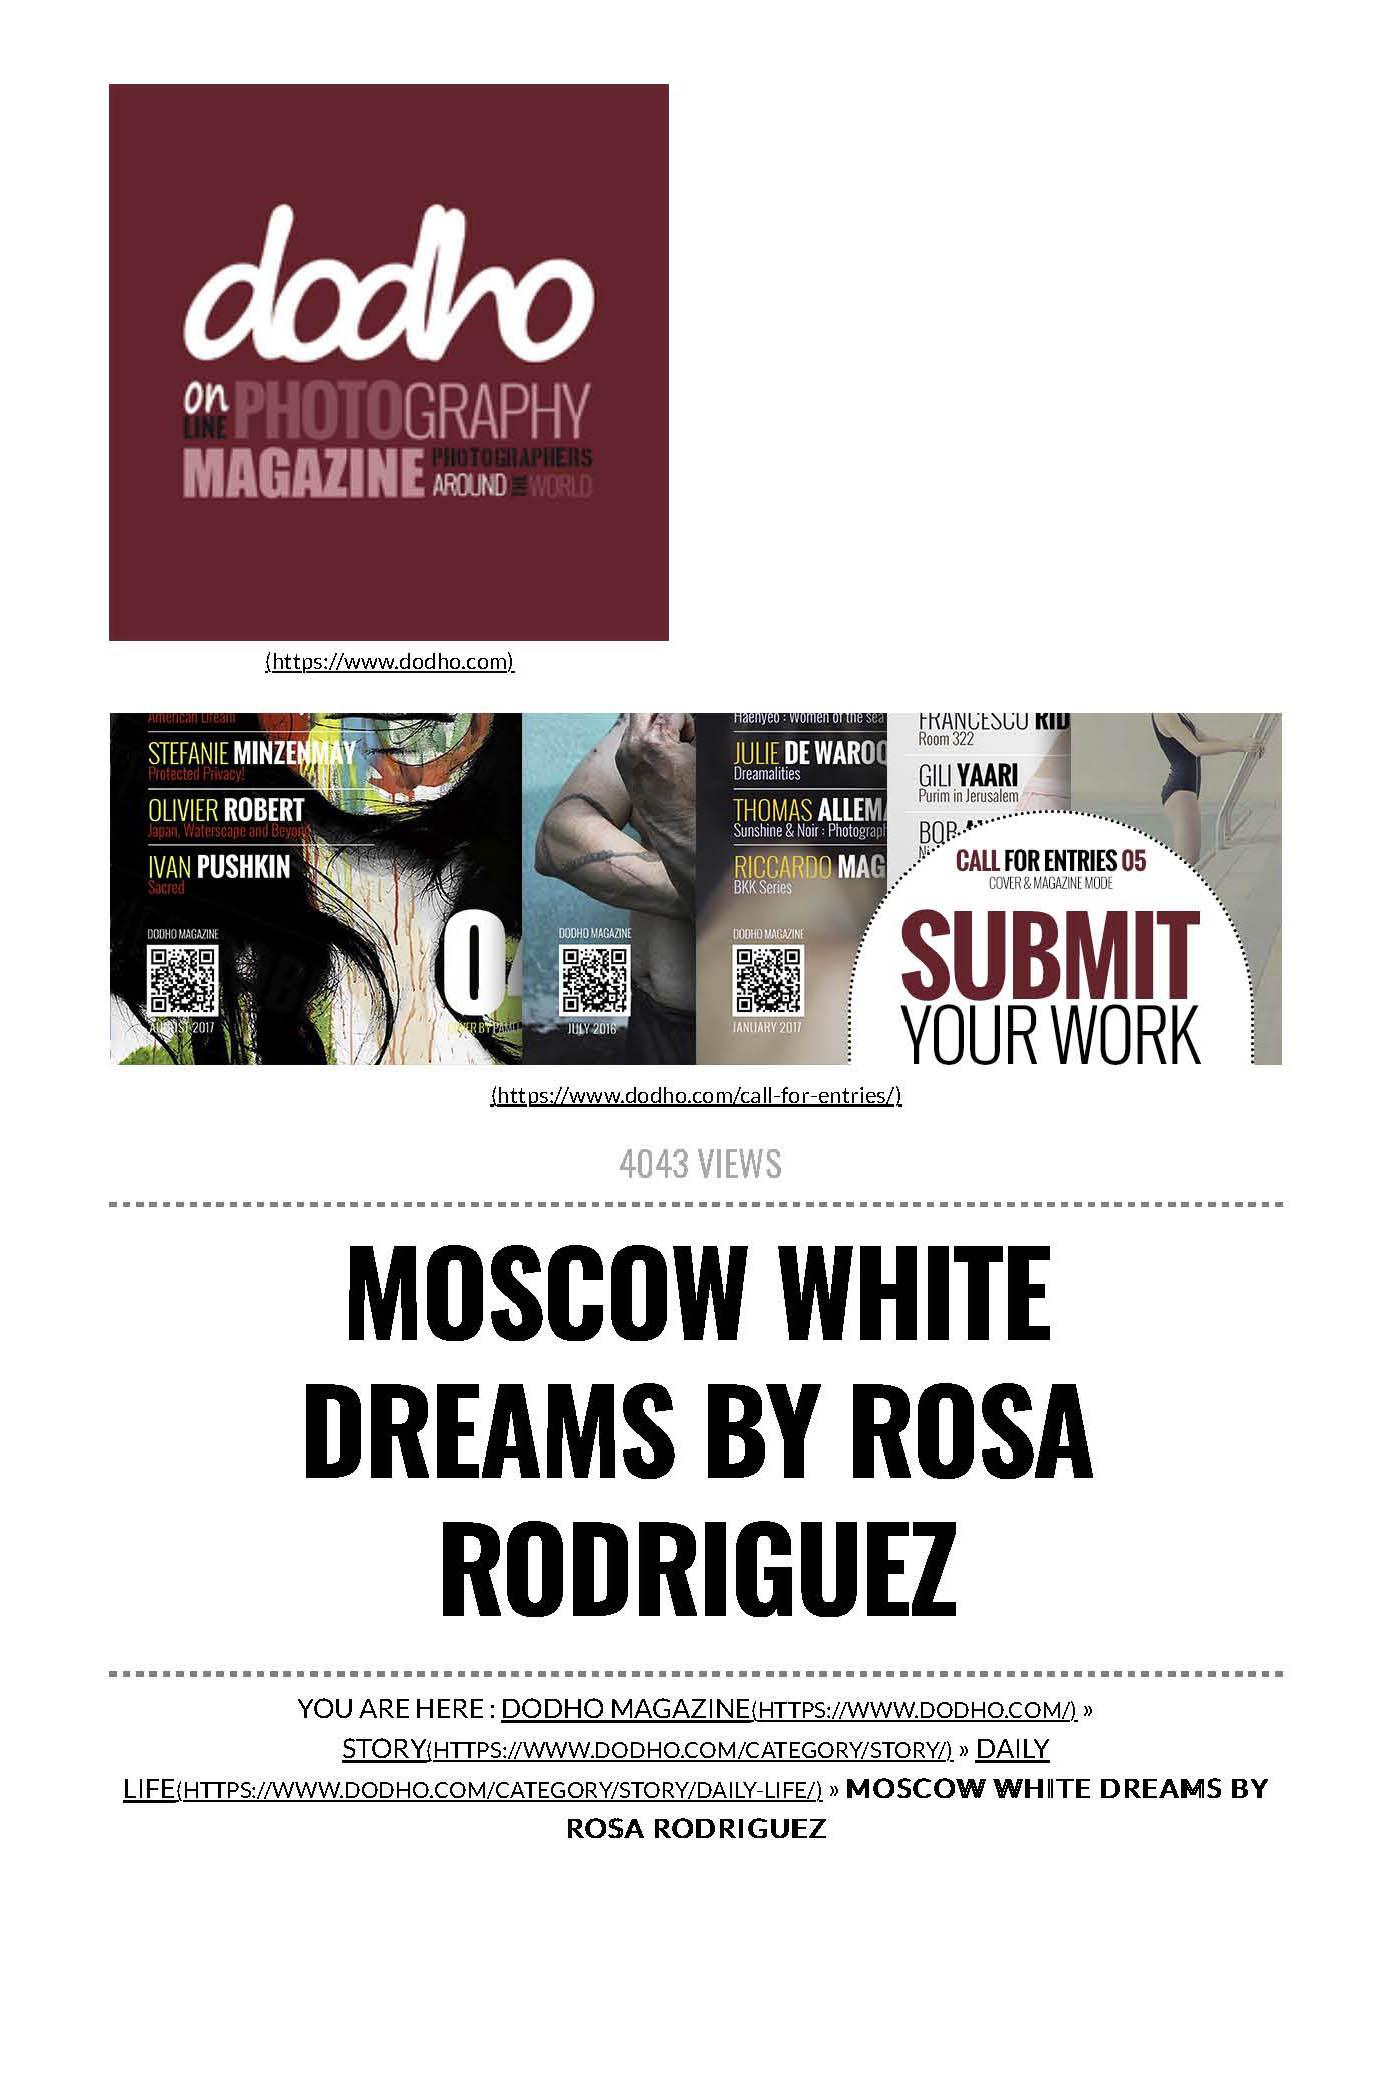 Moscow White Dreams By Rosa Rodriguez | Dodho Magazine_Página_01